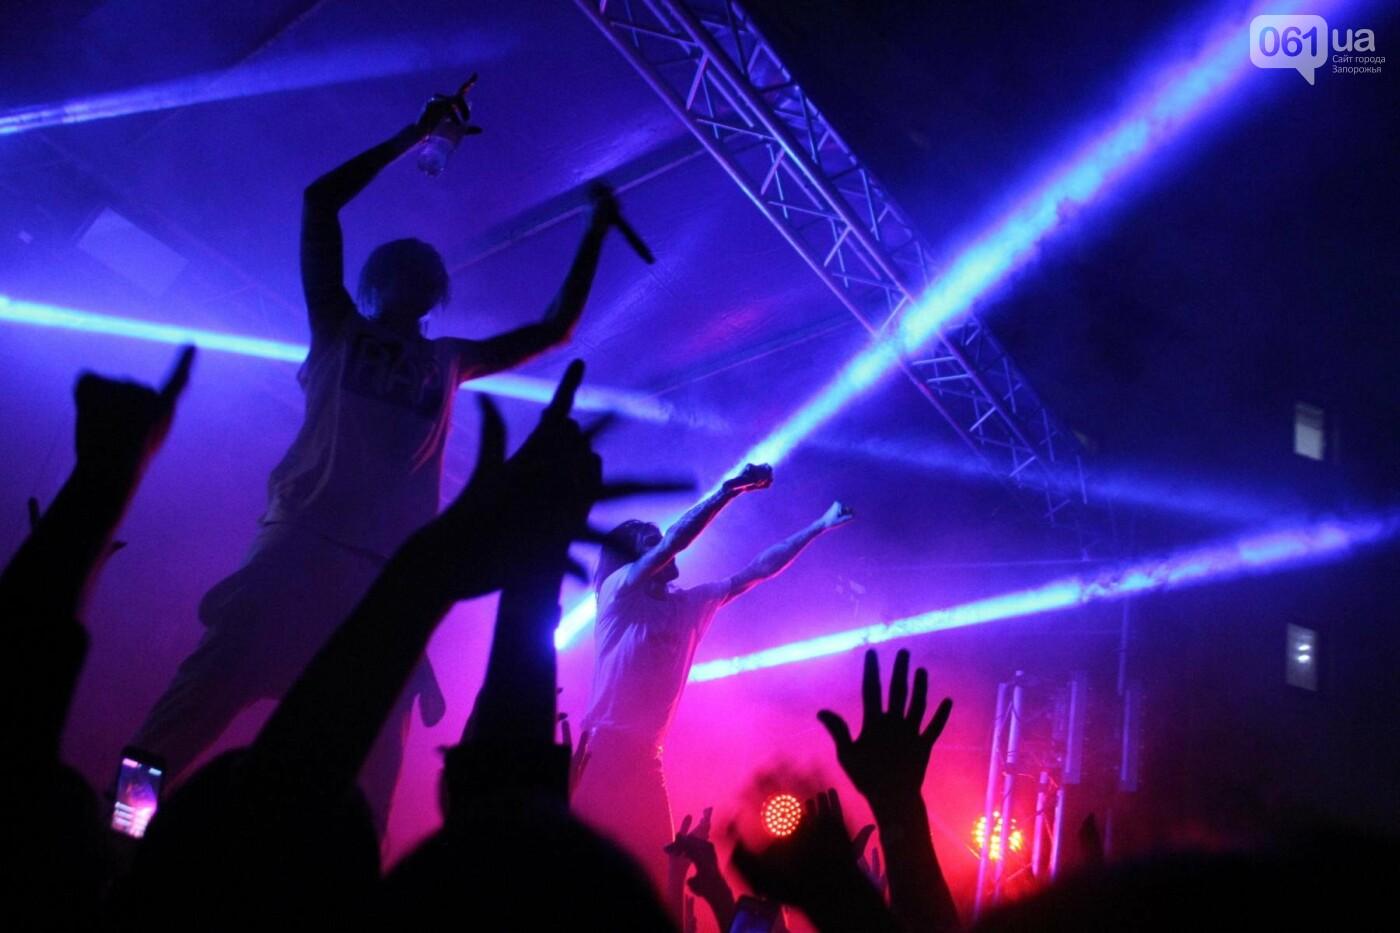 ALEKSEEV, «Агонь» и MamaRika: в Запорожье звезды устроили яркий концерт на «Miss AVRORA Summer 2018», – ФОТОРЕПОРТАЖ, фото-20